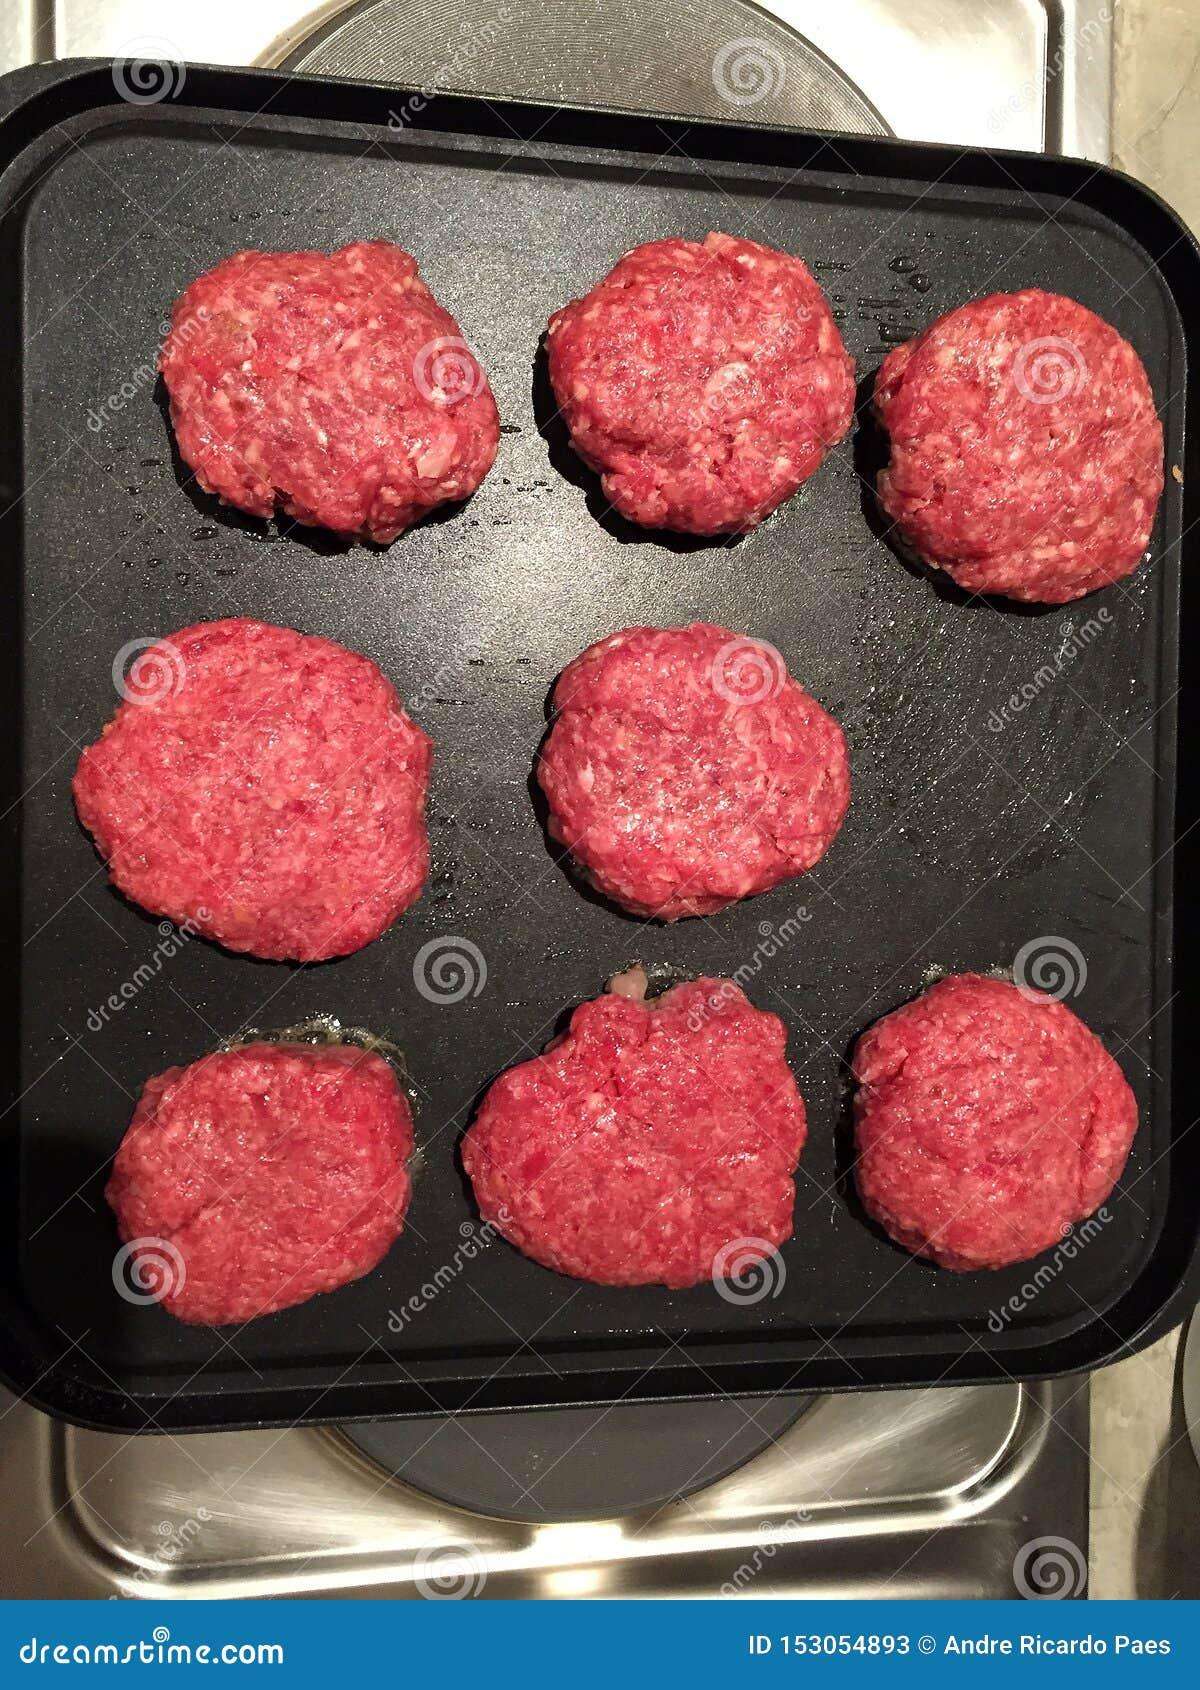 Meat prepared to make hamburger